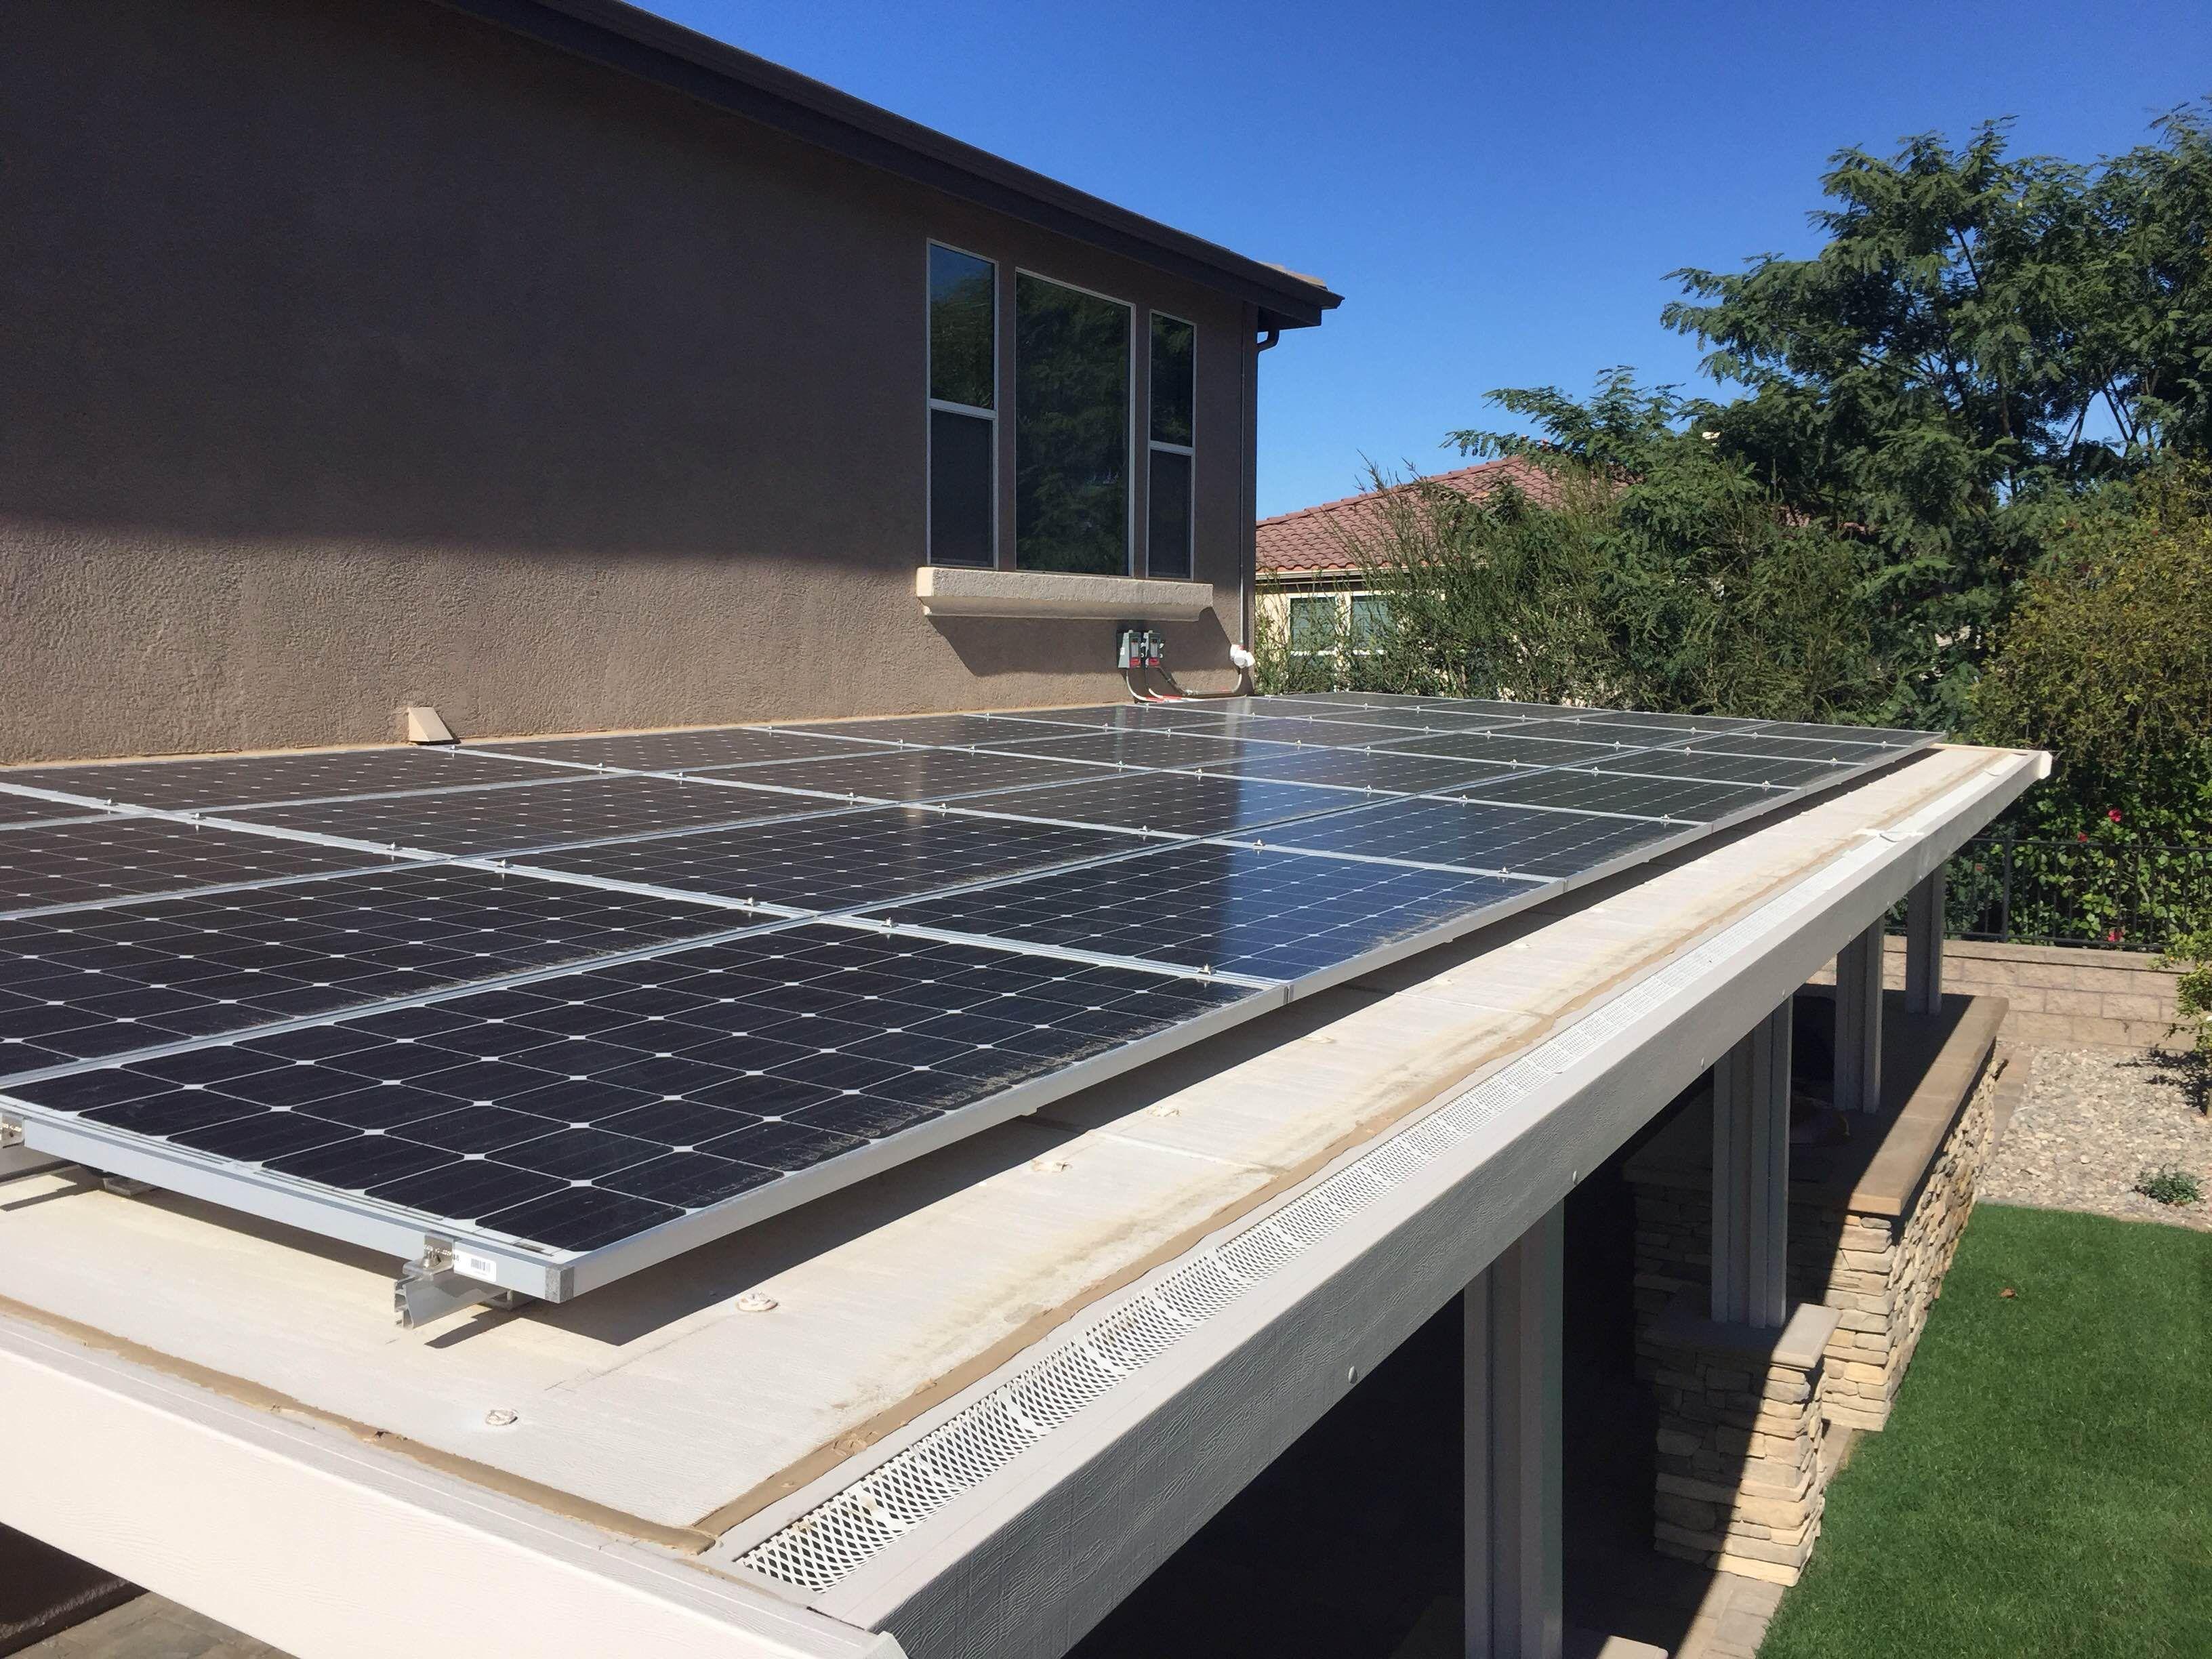 Solar Ready Patio Covers (1)